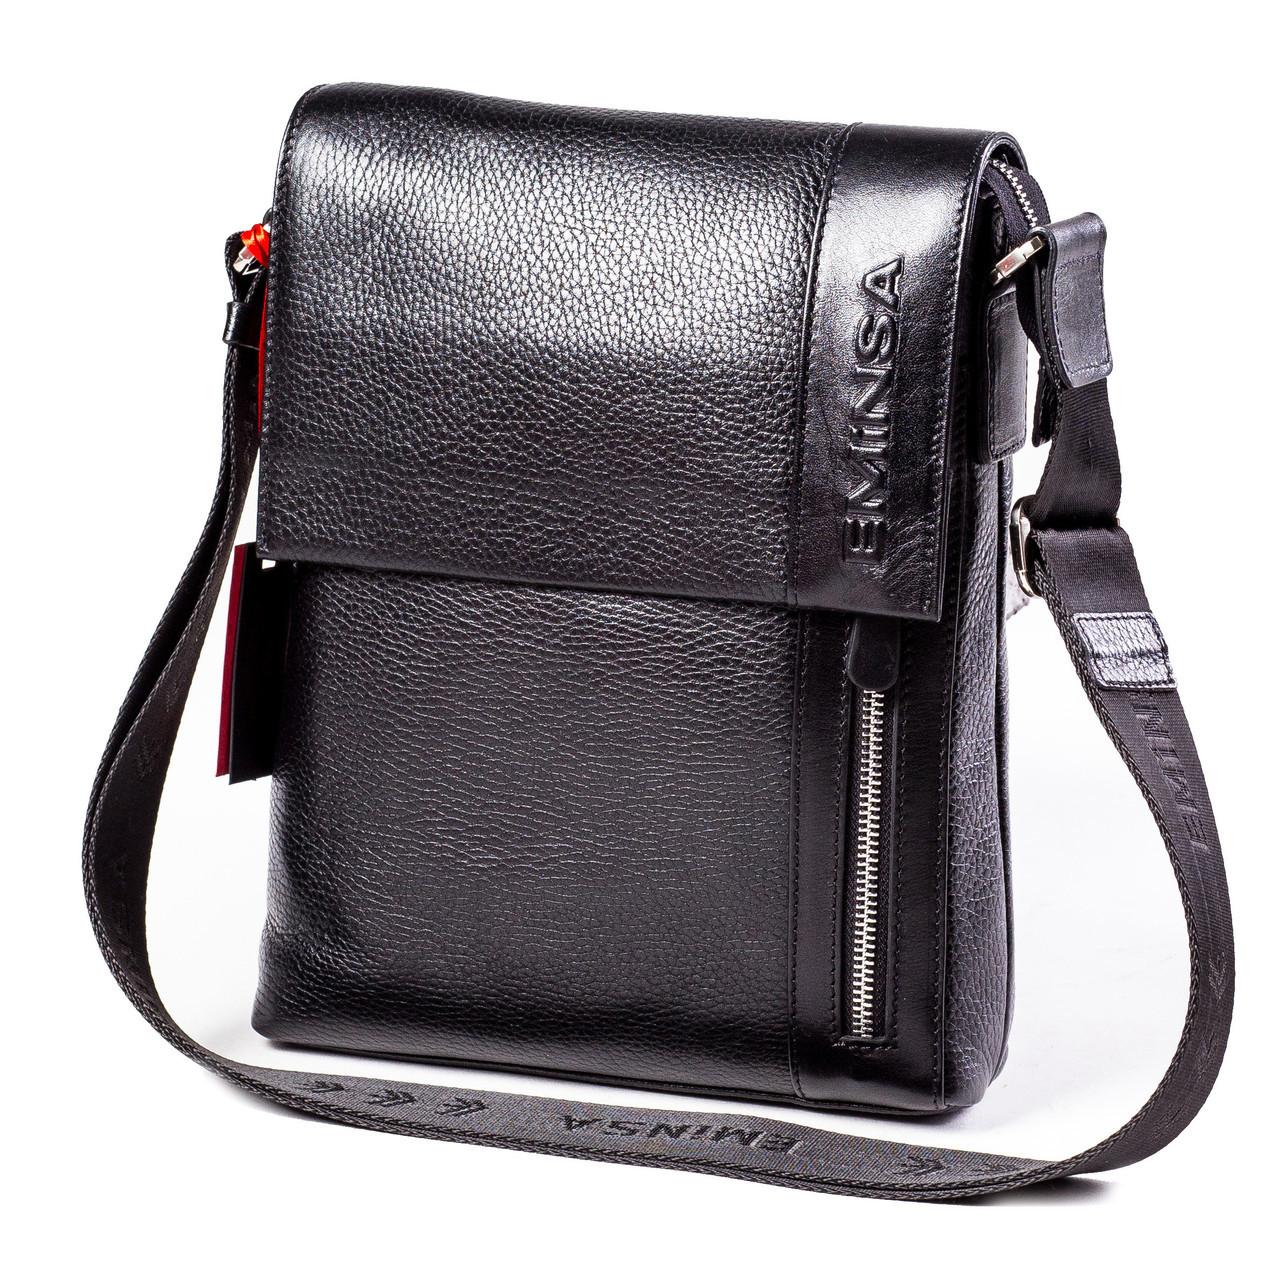 1bba20dda194 Мужская сумка кожаная черная Eminsa 6044-37-1  продажа, цена в ...